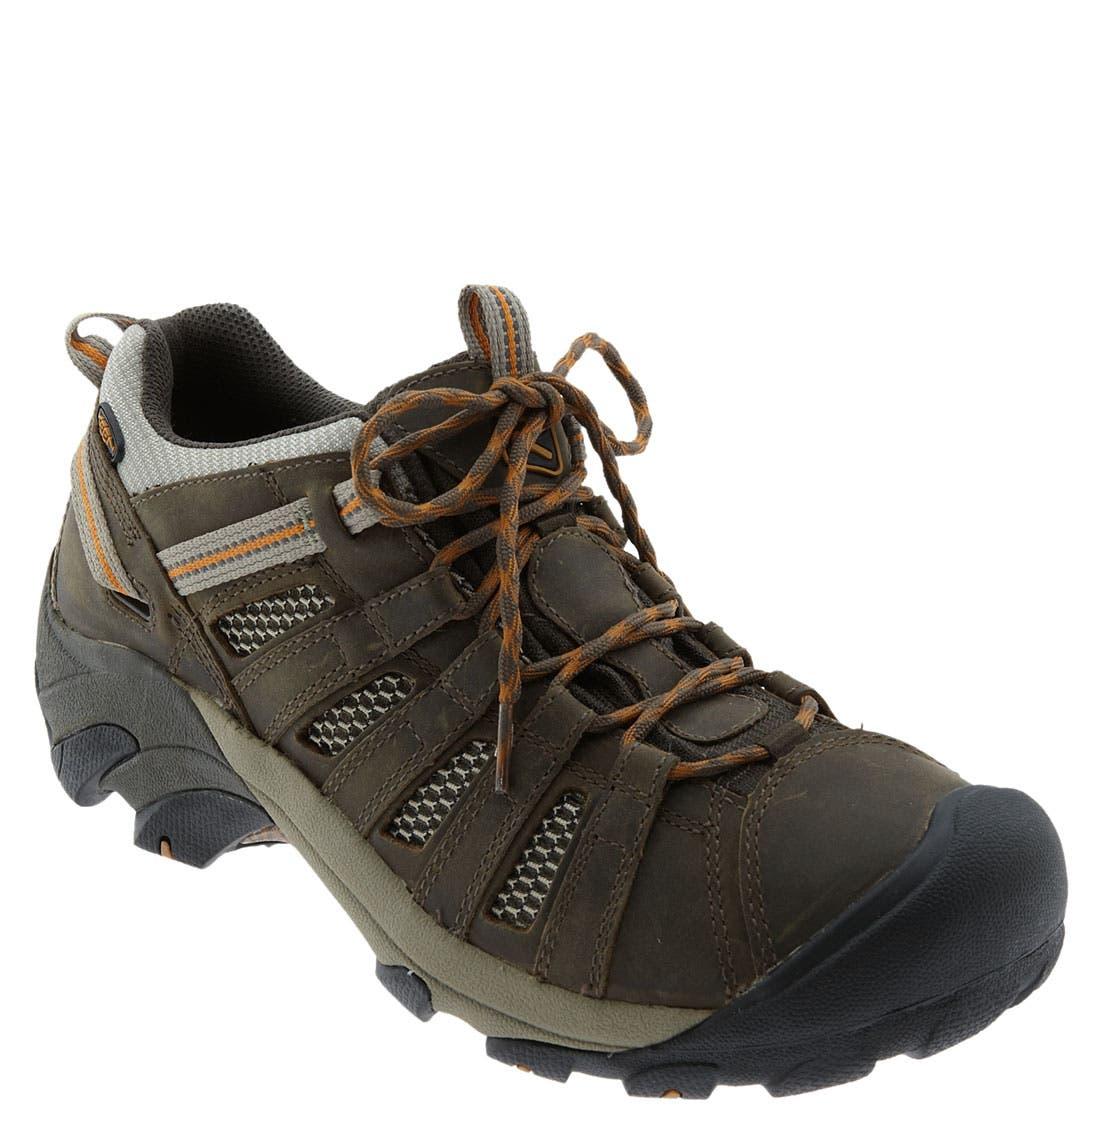 Alternate Image 1 Selected - Keen 'Voyageur' Hiking Shoe (Men)